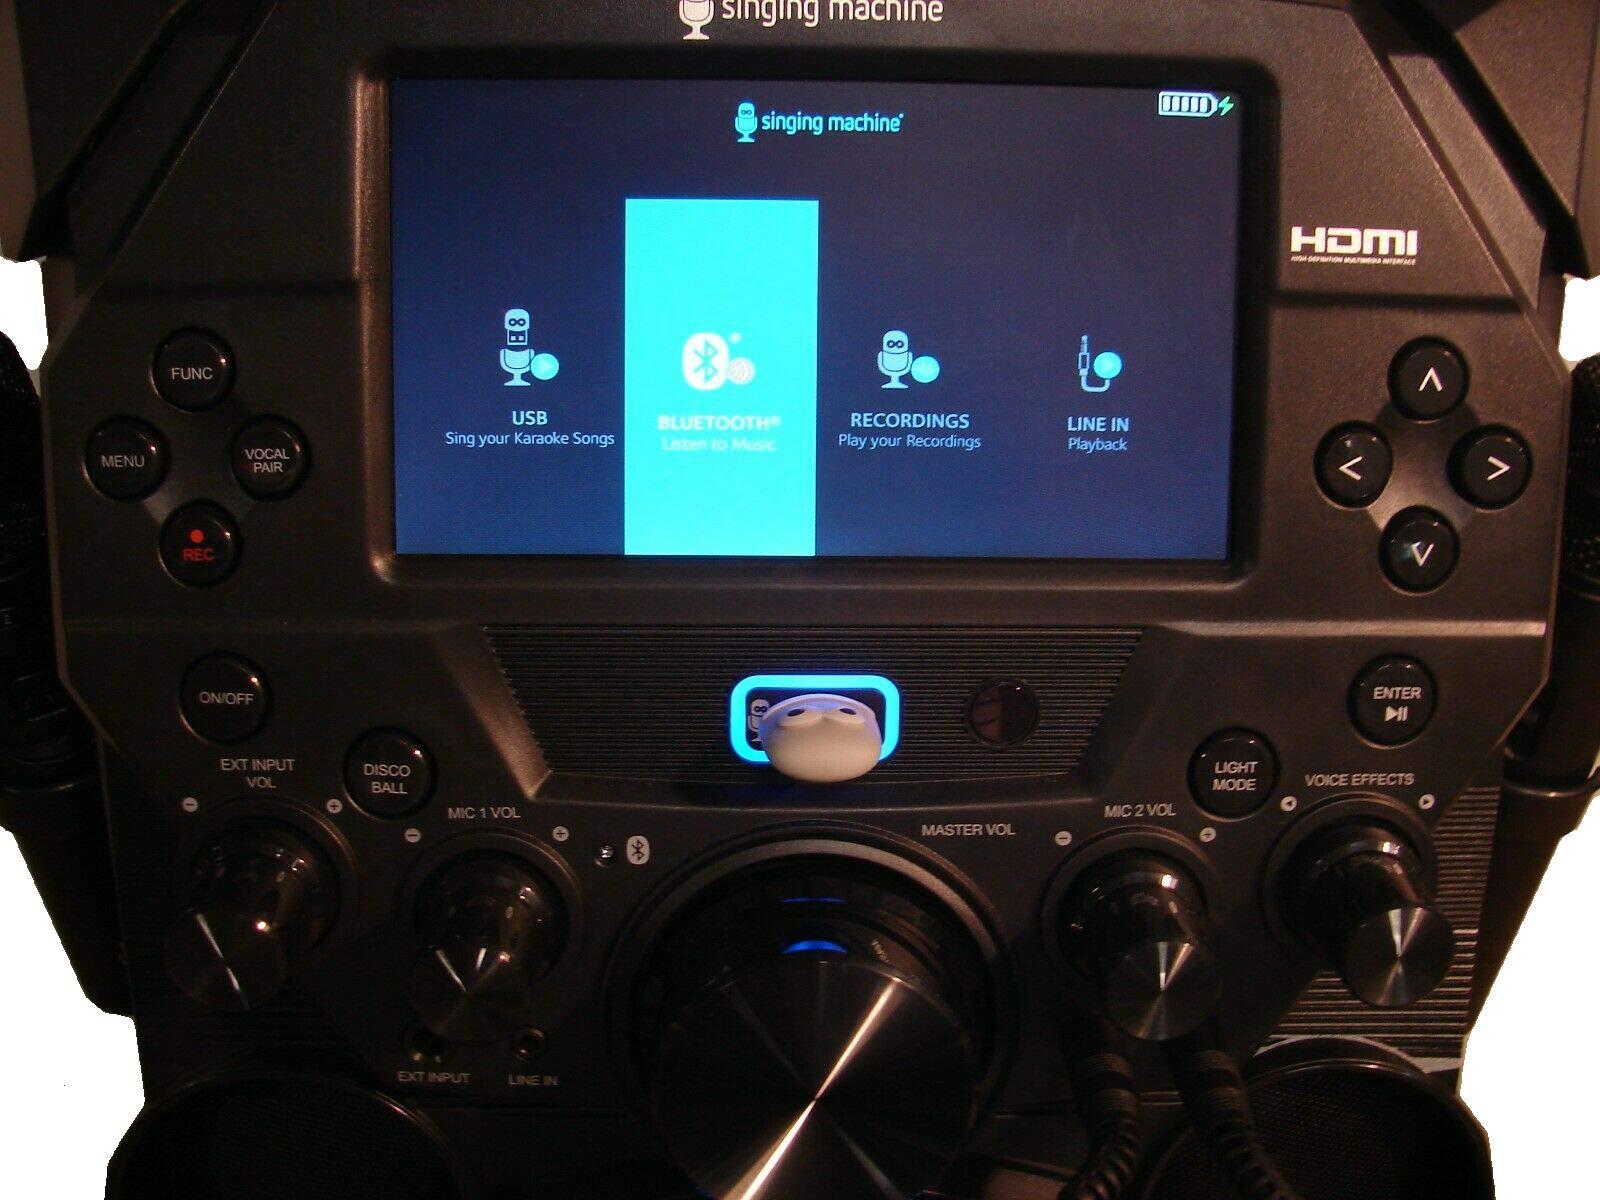 Amoldar 5inging Machine Fiest@ Voice Hi-Definition Karaoke System SDL9040 by Amoldar (Image #2)